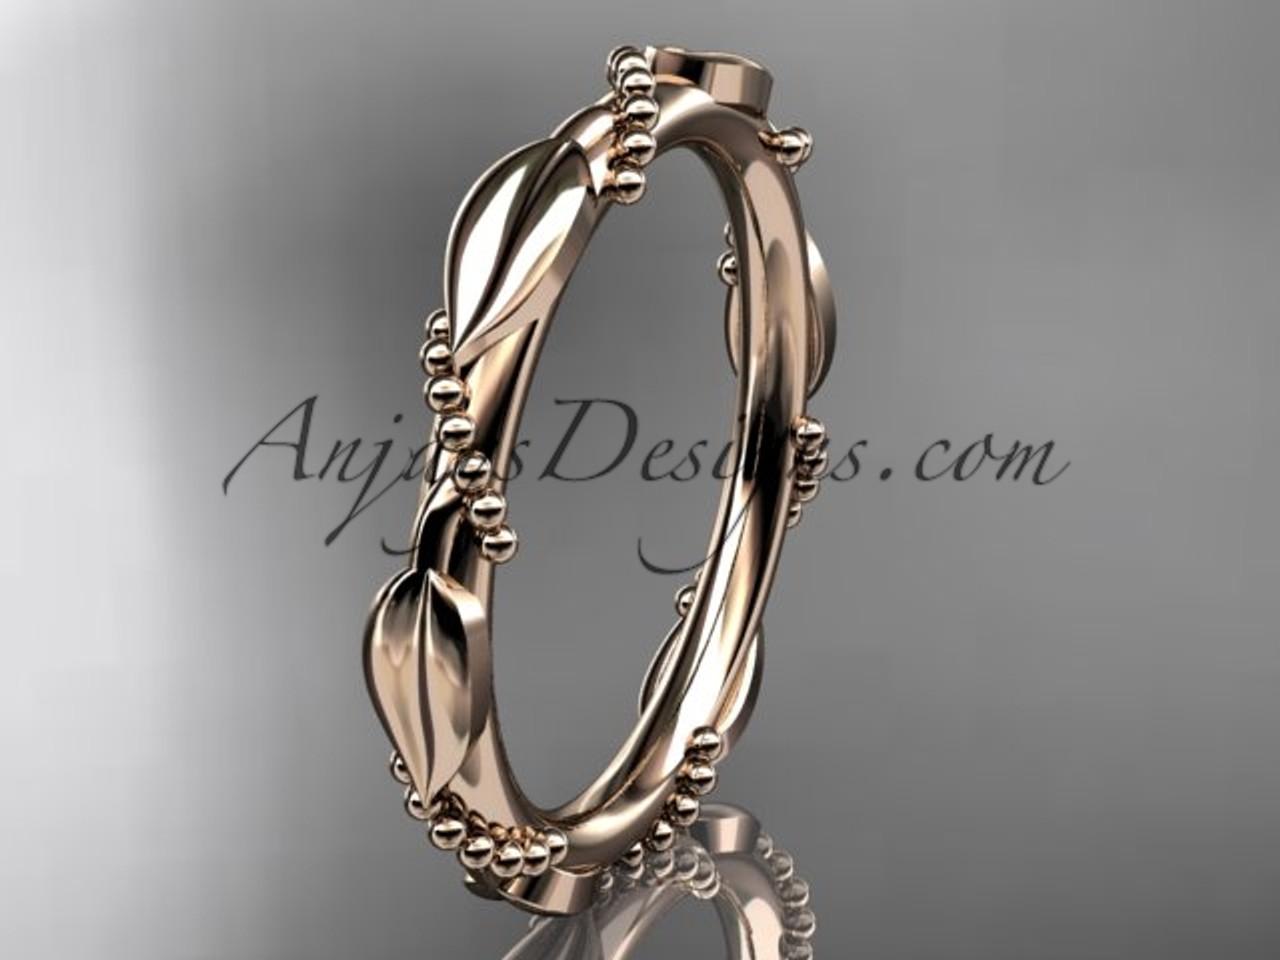 14k rose gold ring design for female without stone engagement ring wedding band adlr178b - Wedding Ring Design